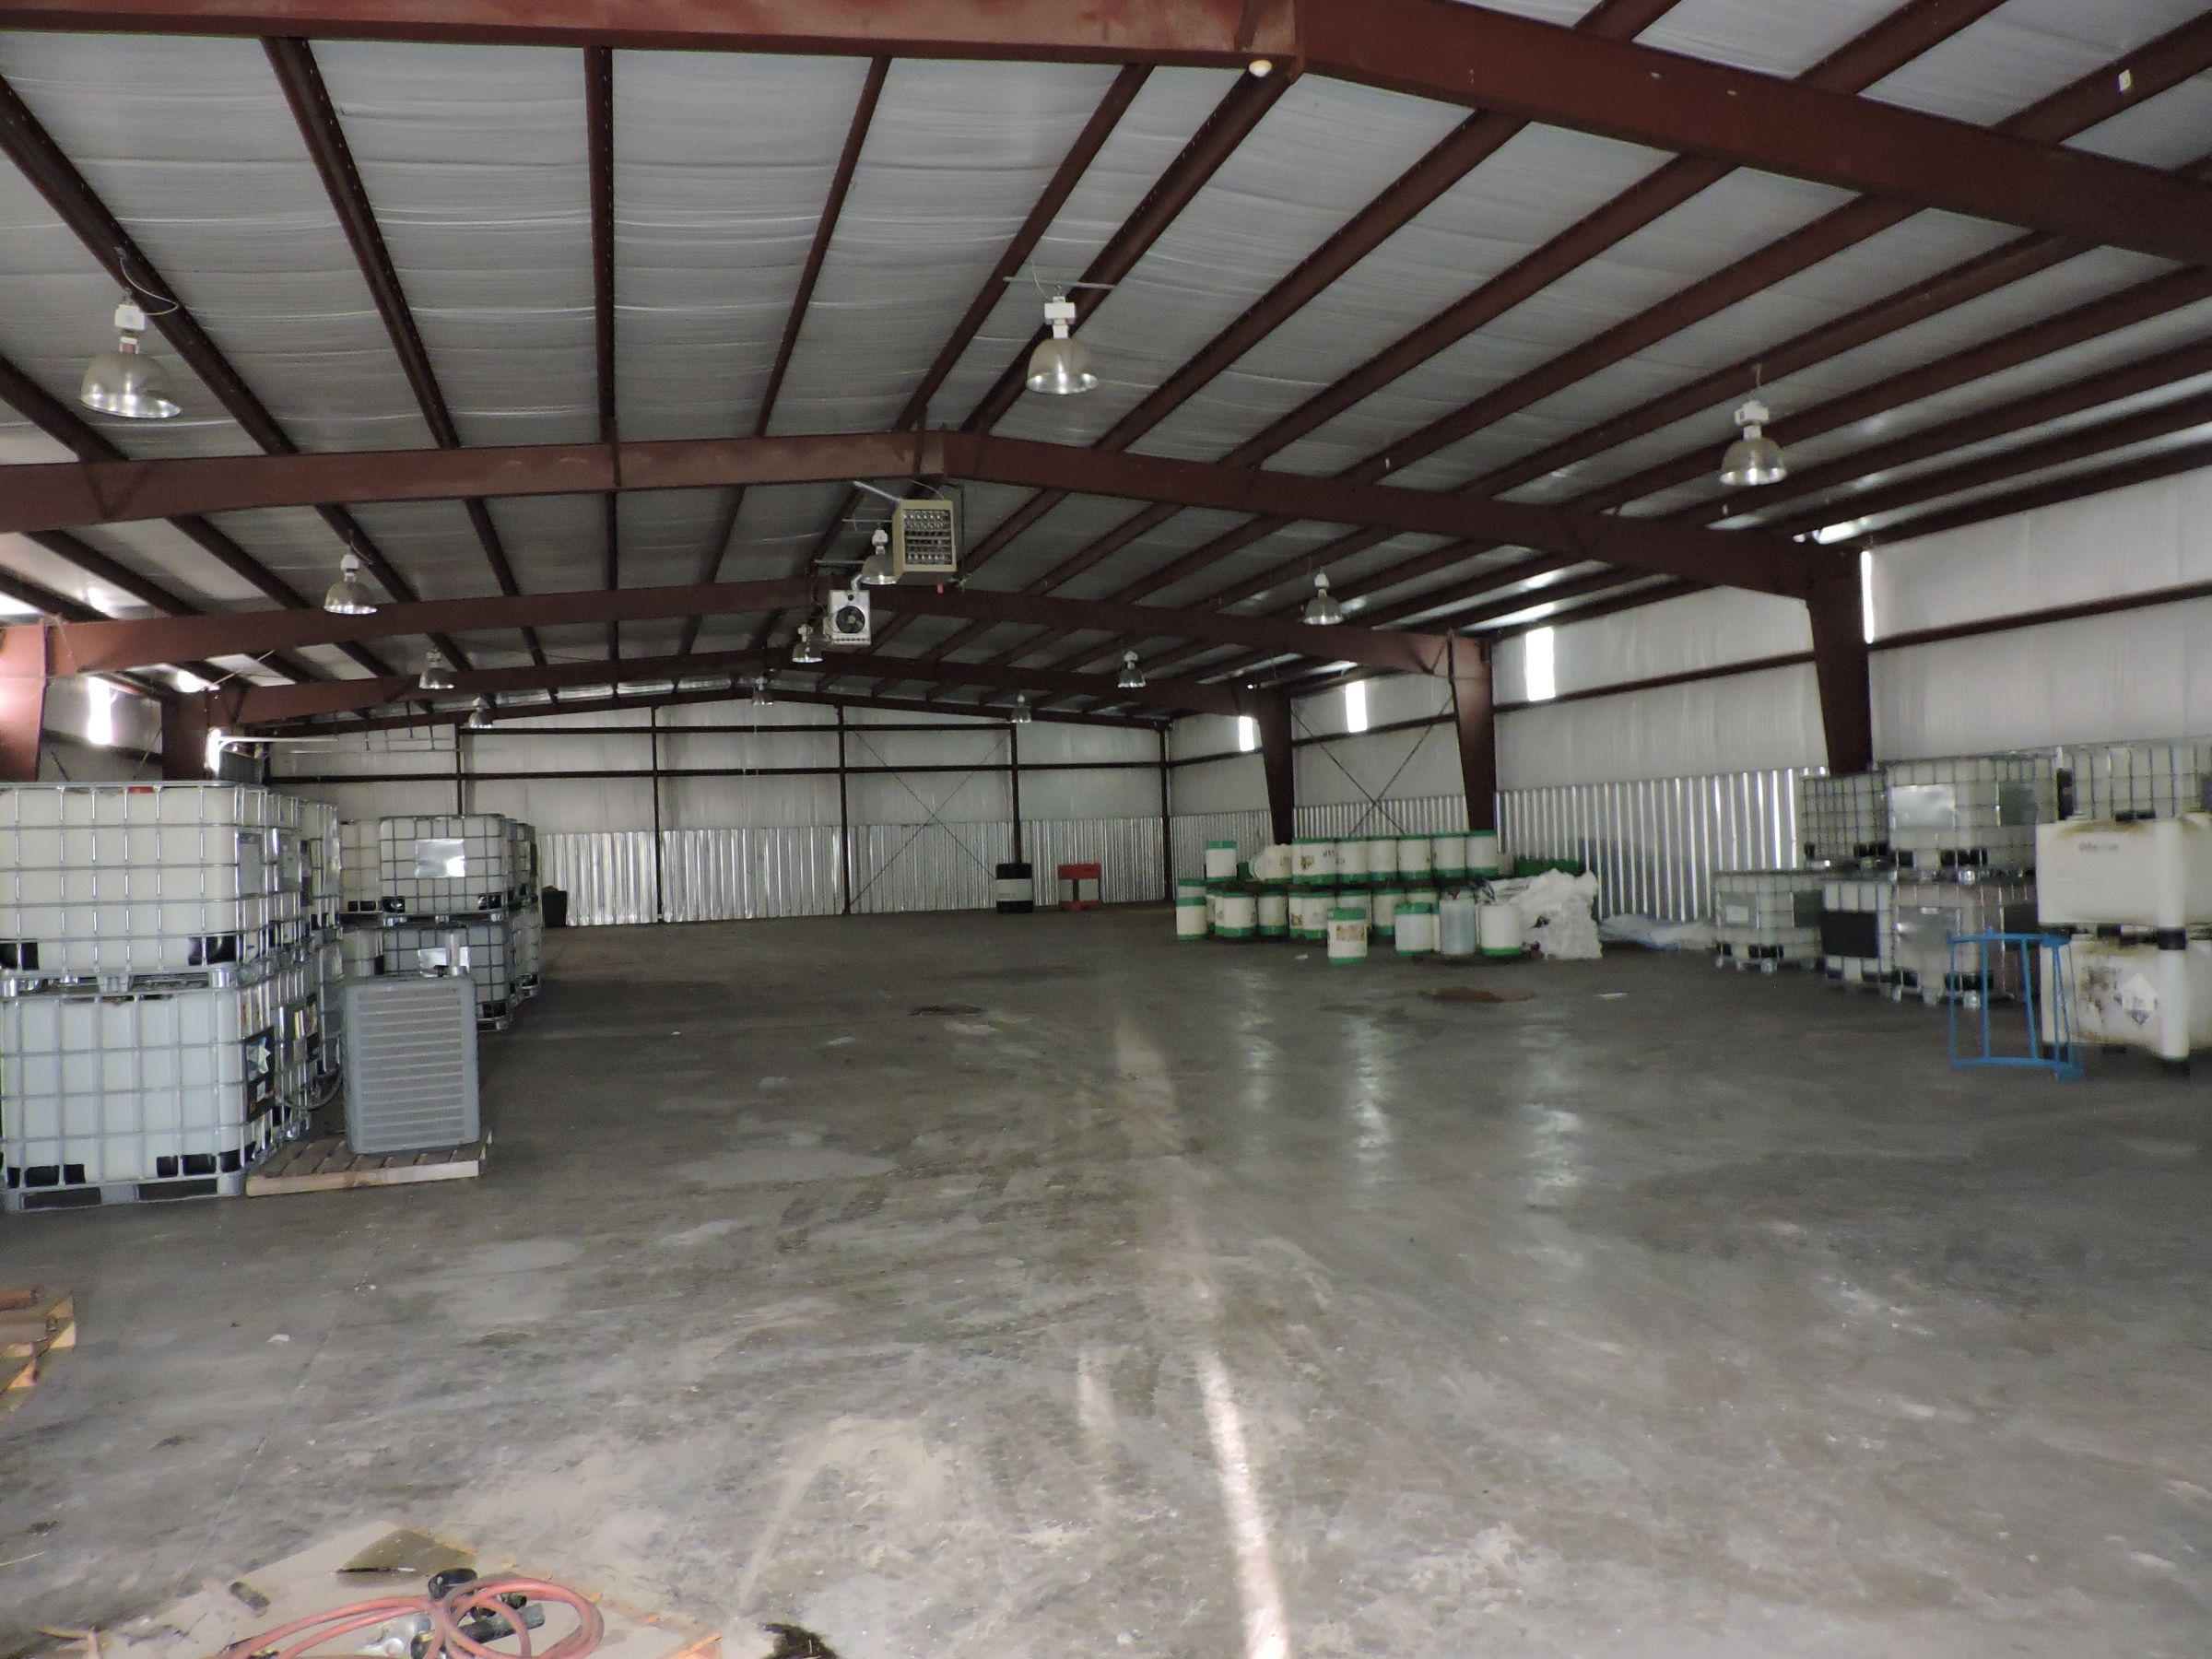 commercial-mississippi-county-arkansas-11-acres-listing-number-15009-0-2020-06-08-194623.JPG